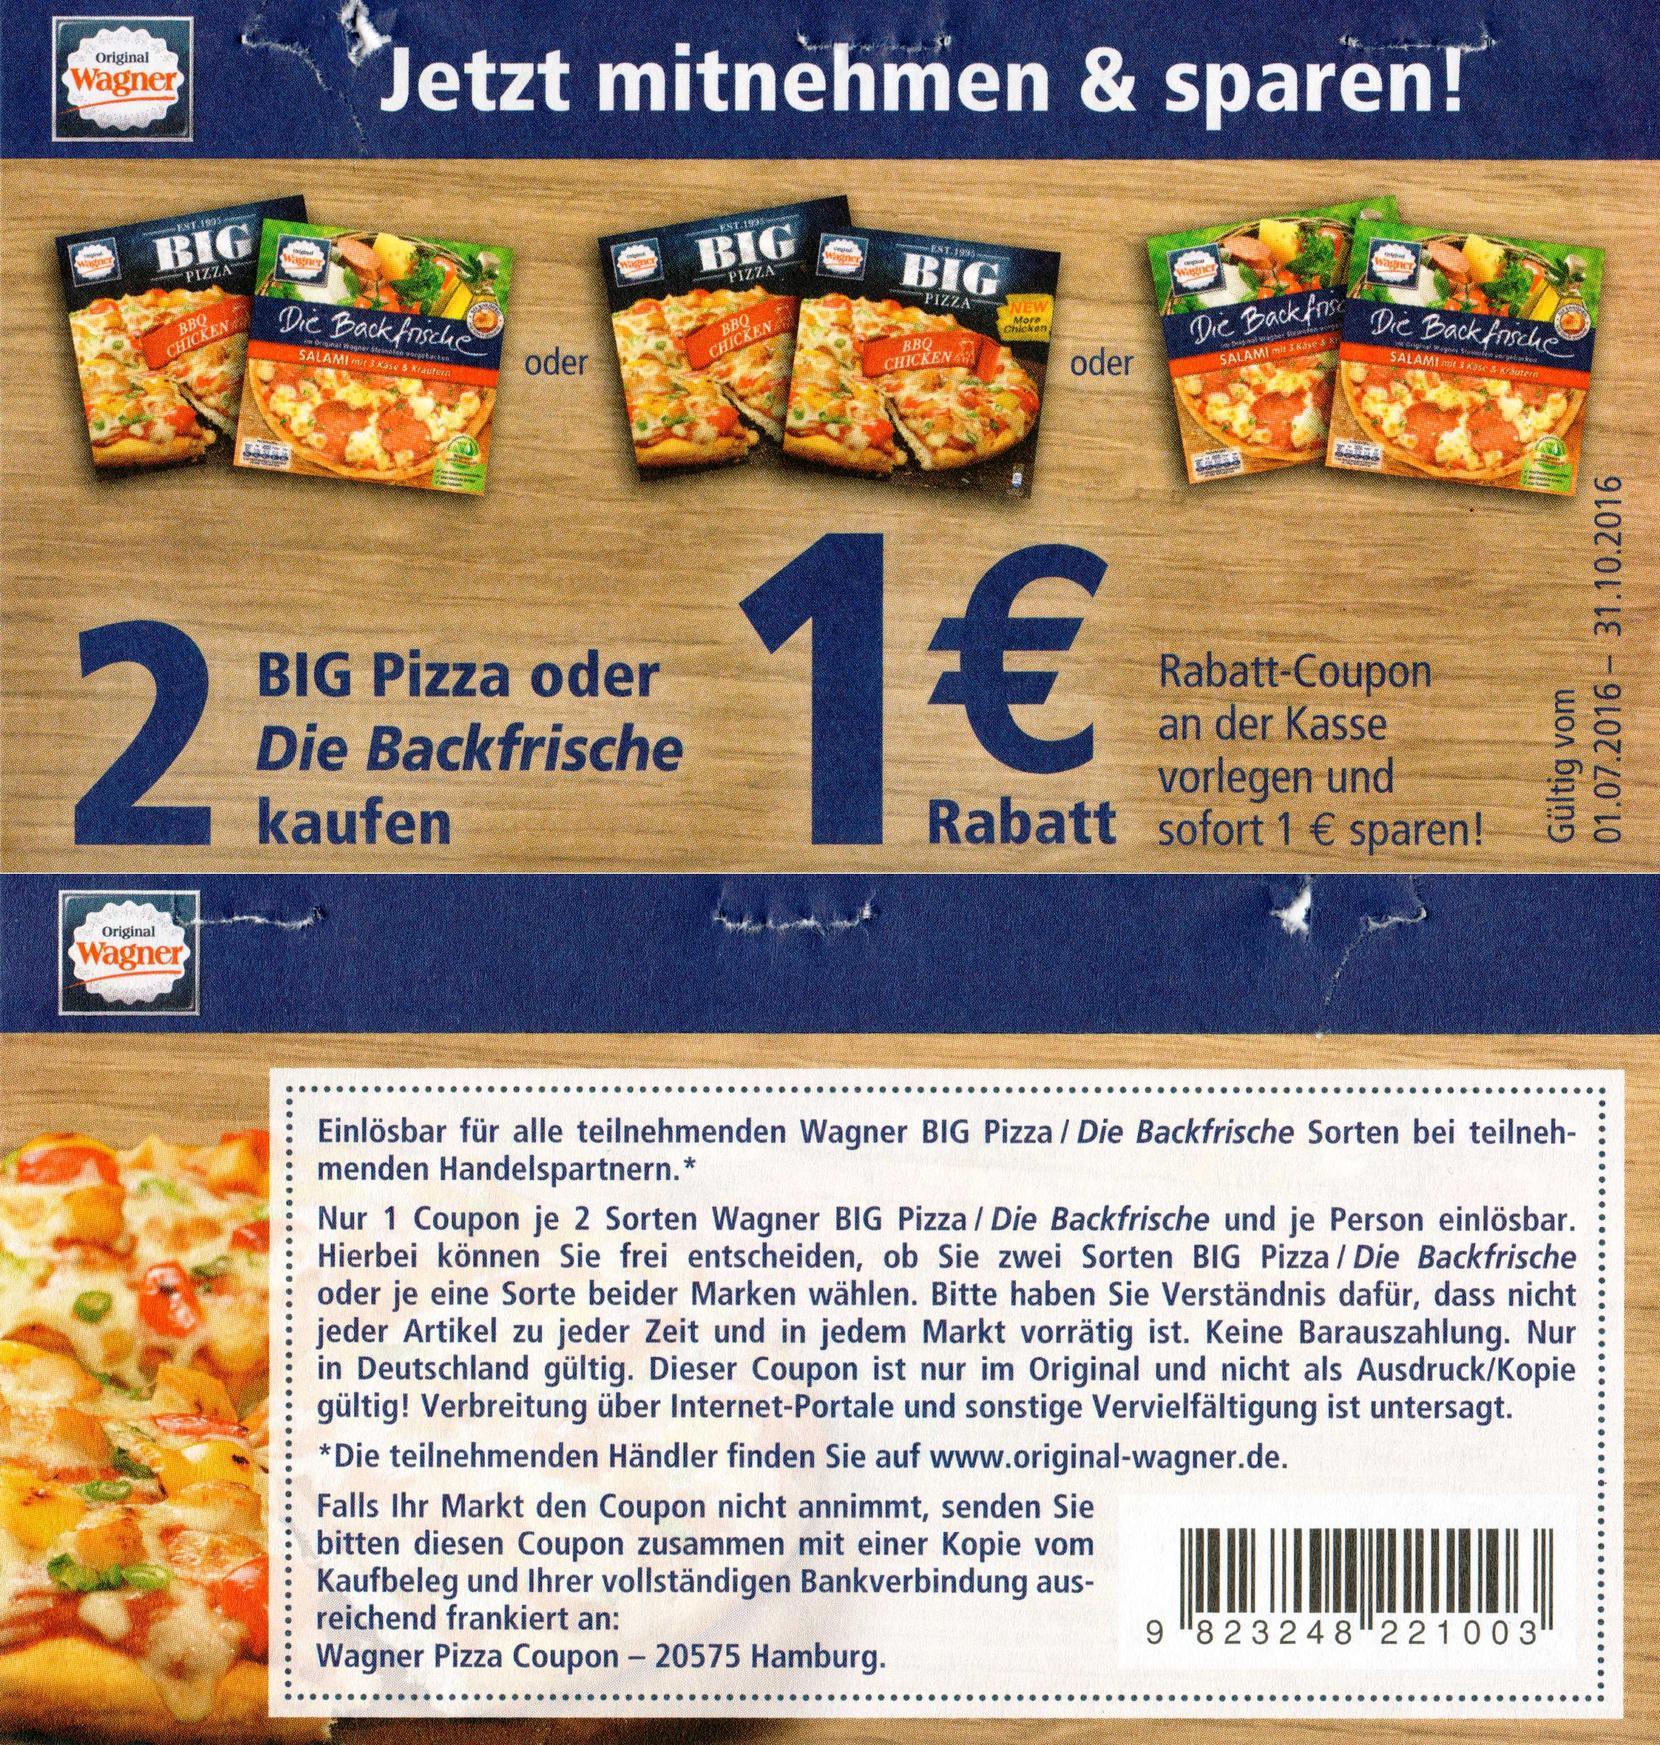 bundesweit neuer 1 00 sofort rabatt coupon auf 2x wagner big pizza oder backfrische. Black Bedroom Furniture Sets. Home Design Ideas